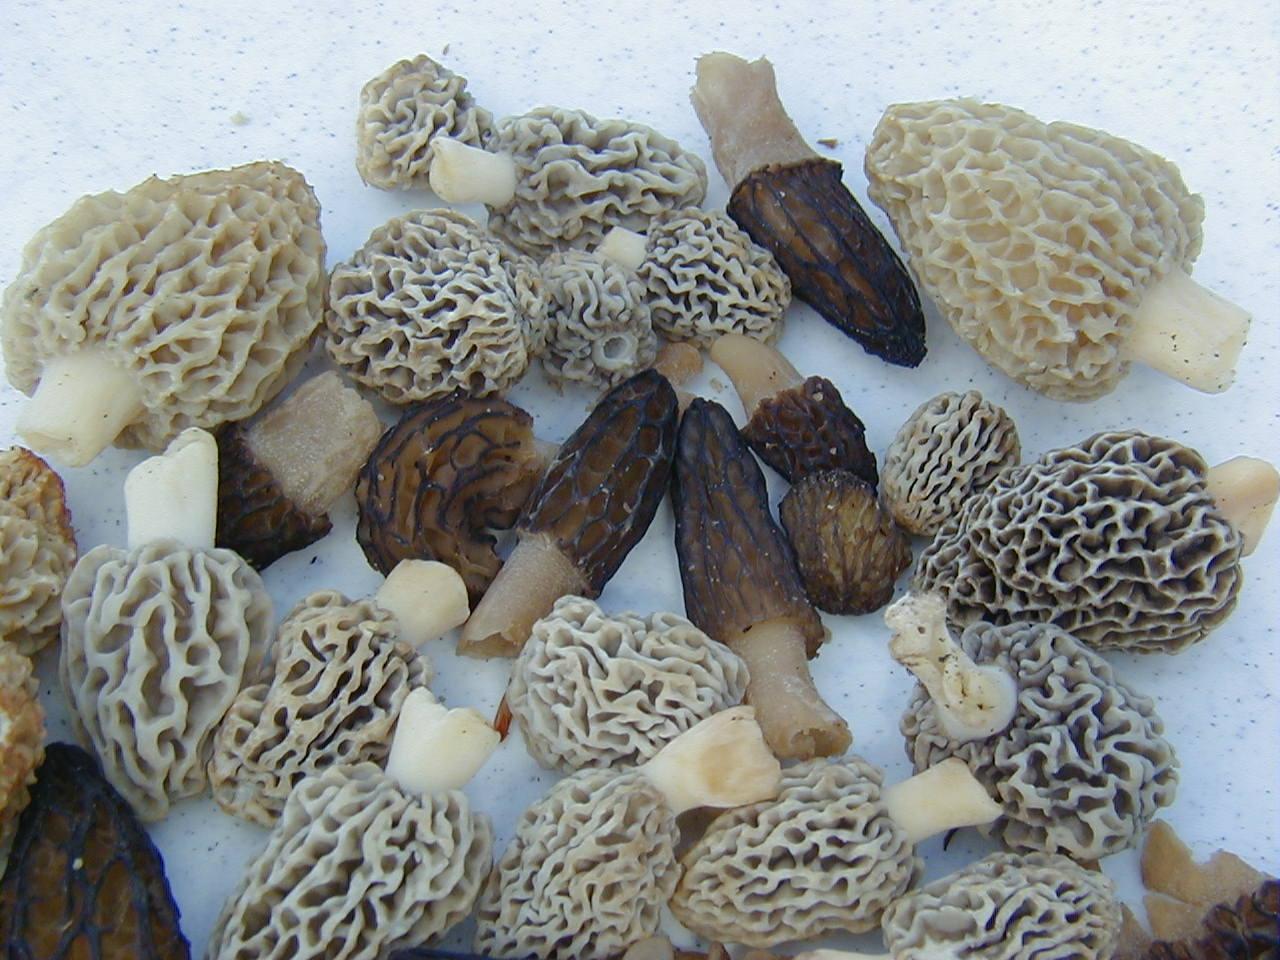 Mushroom hunting Spring and Fall